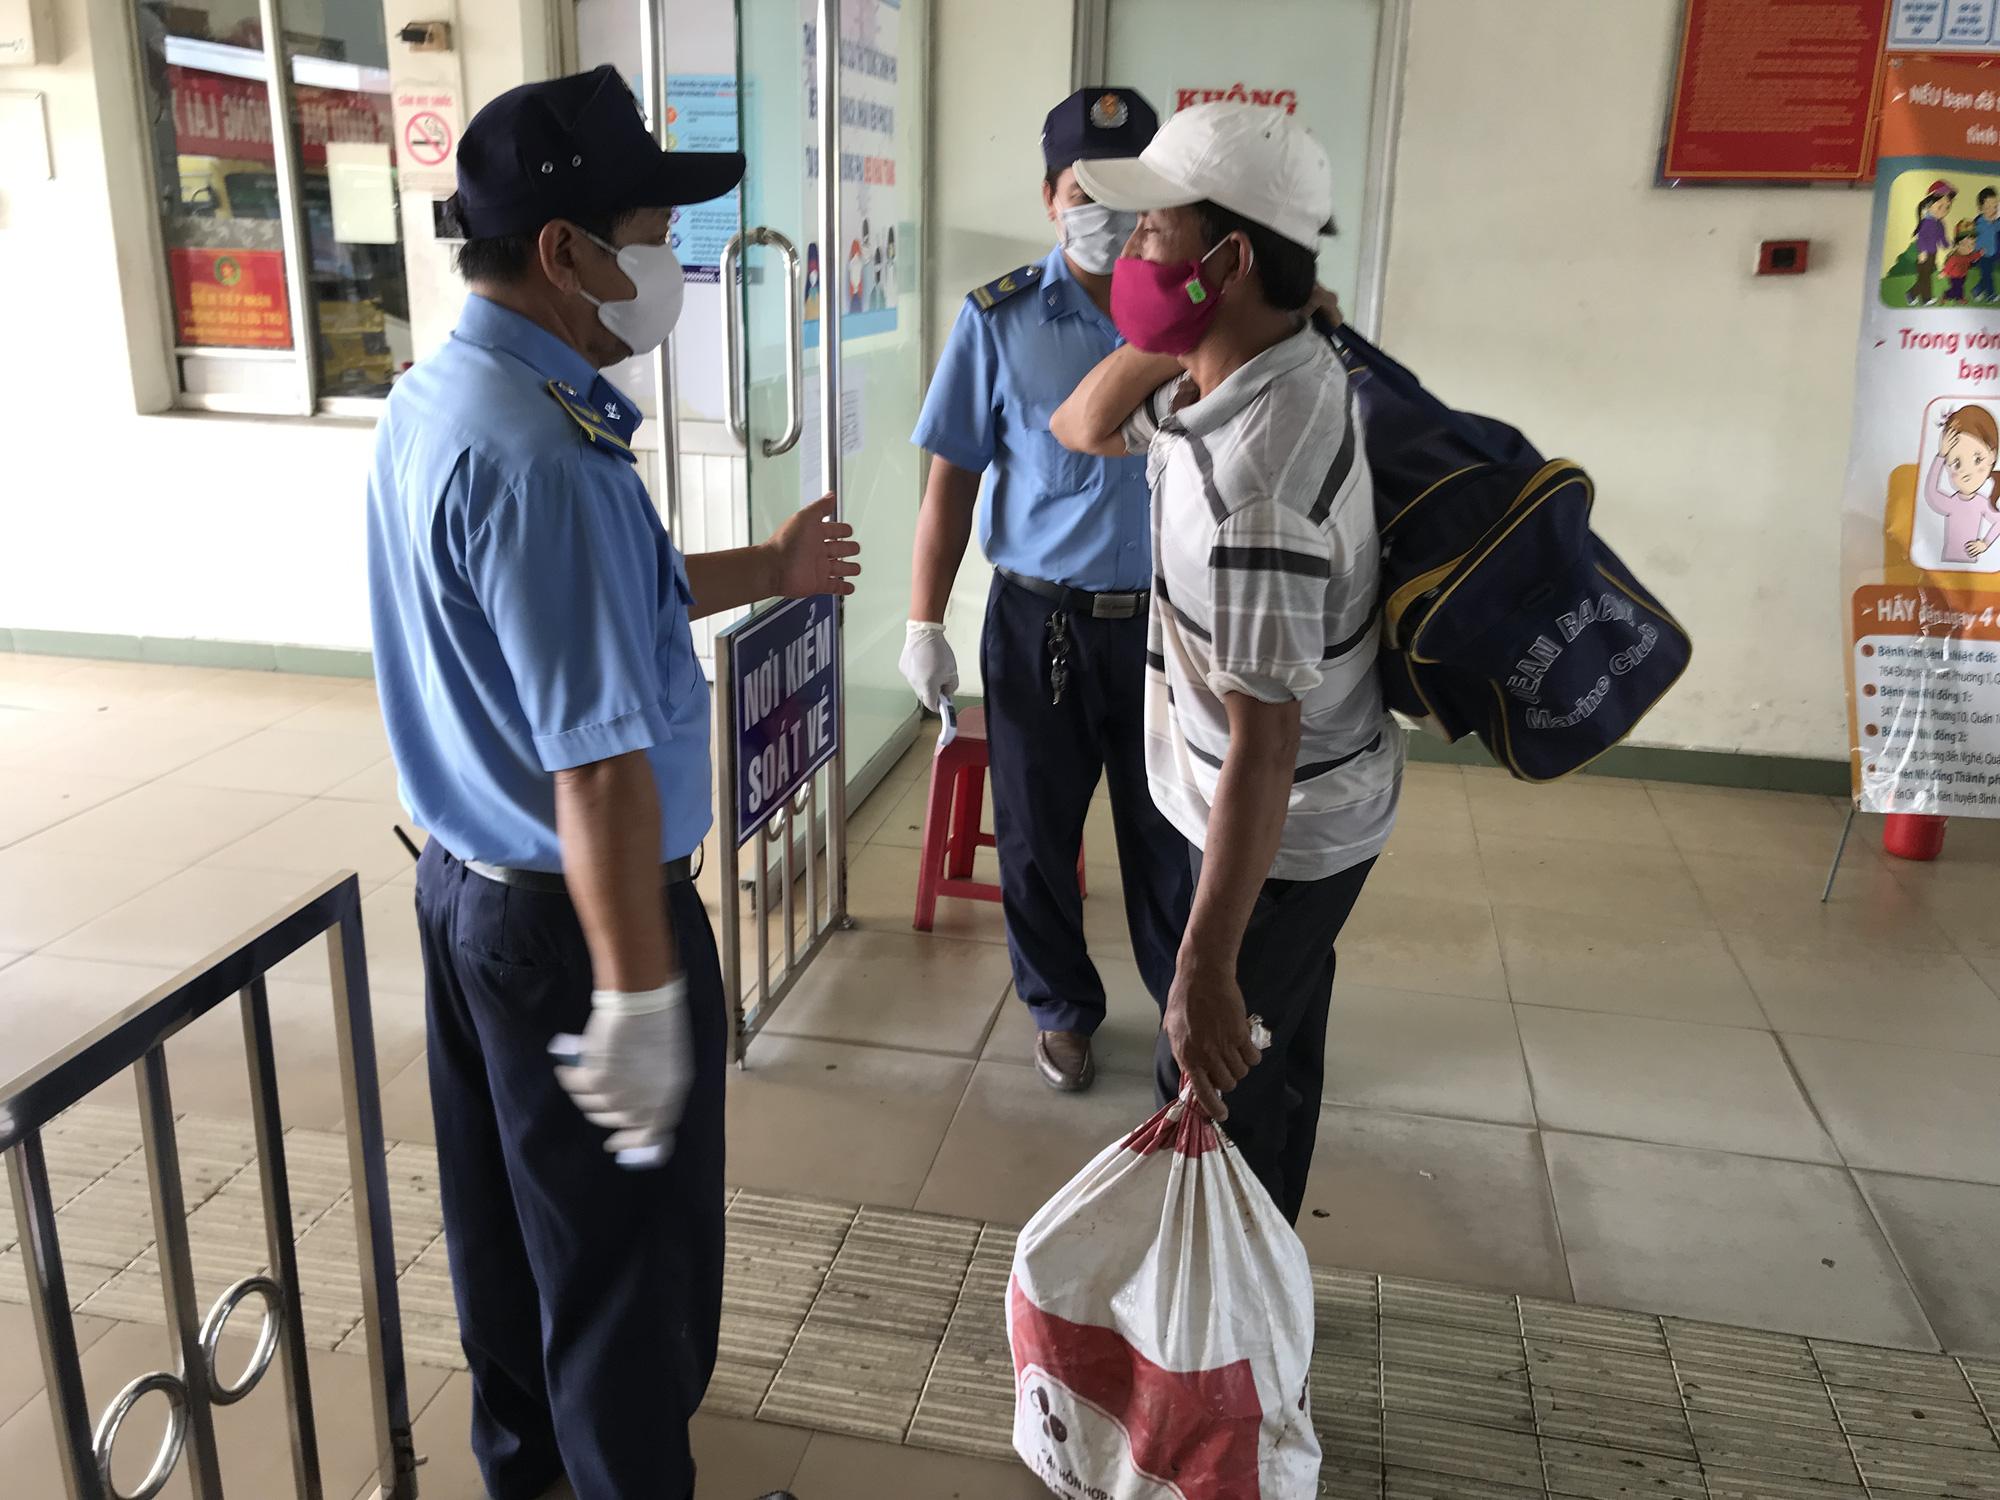 Passenger transport services suspended until further notice in Saigon